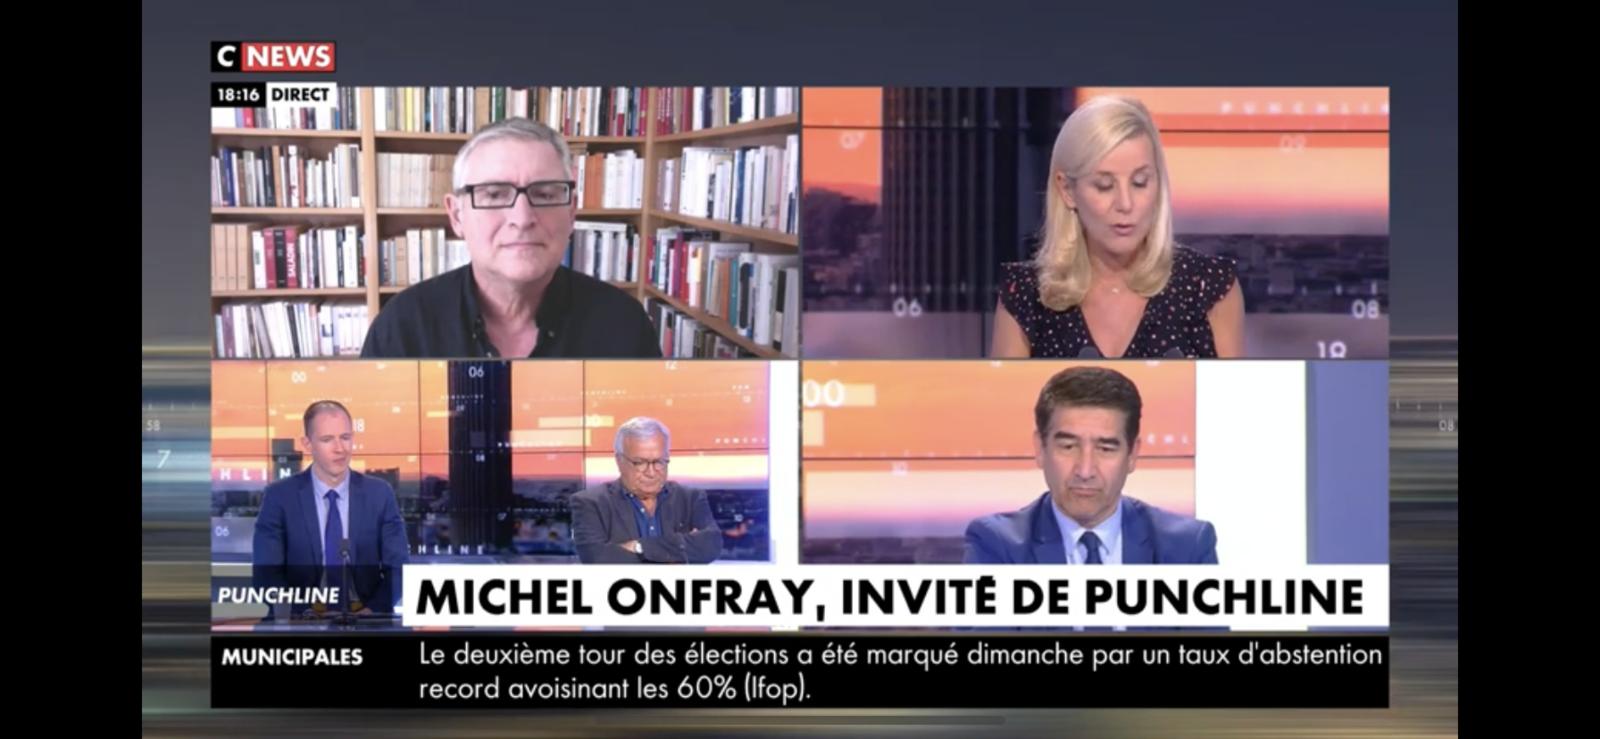 Michel Onfray - Punchline (CNews) - 29.06.2020